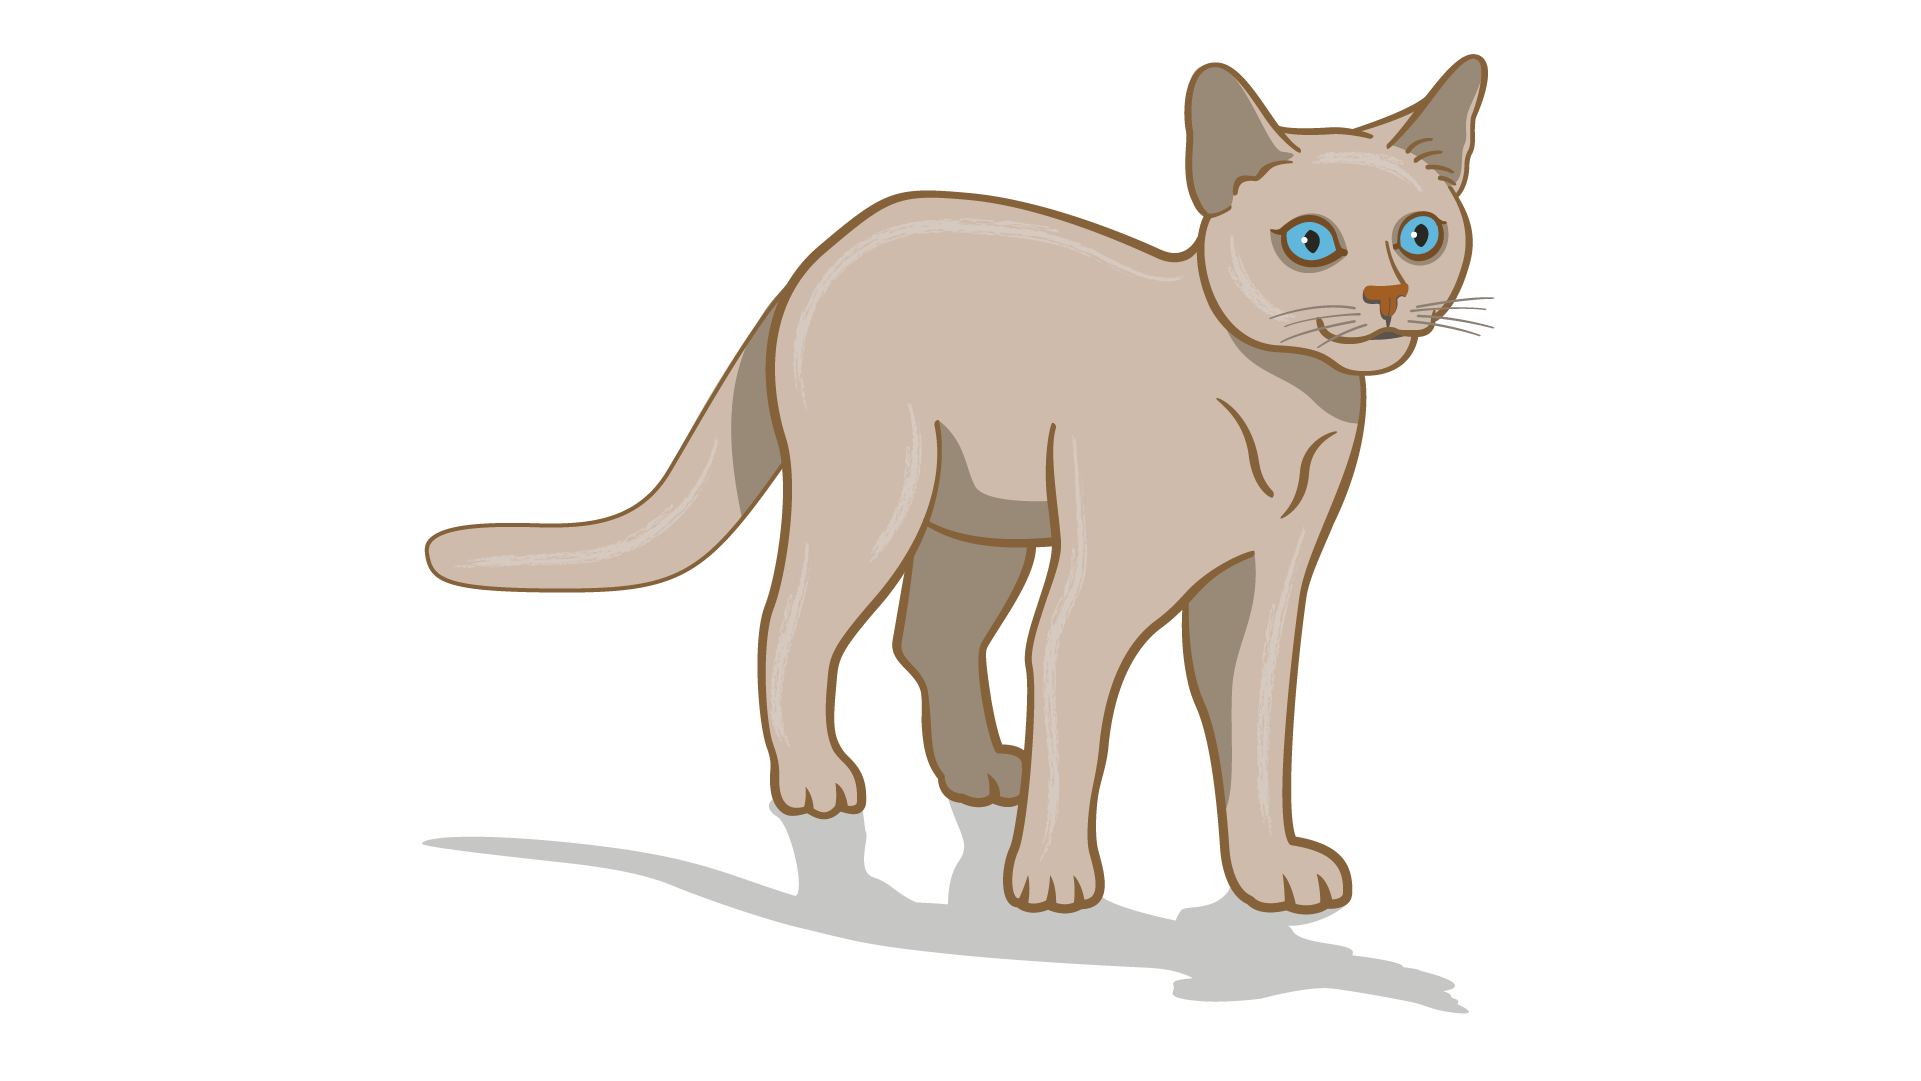 lenguaje corporal de gato enfocado